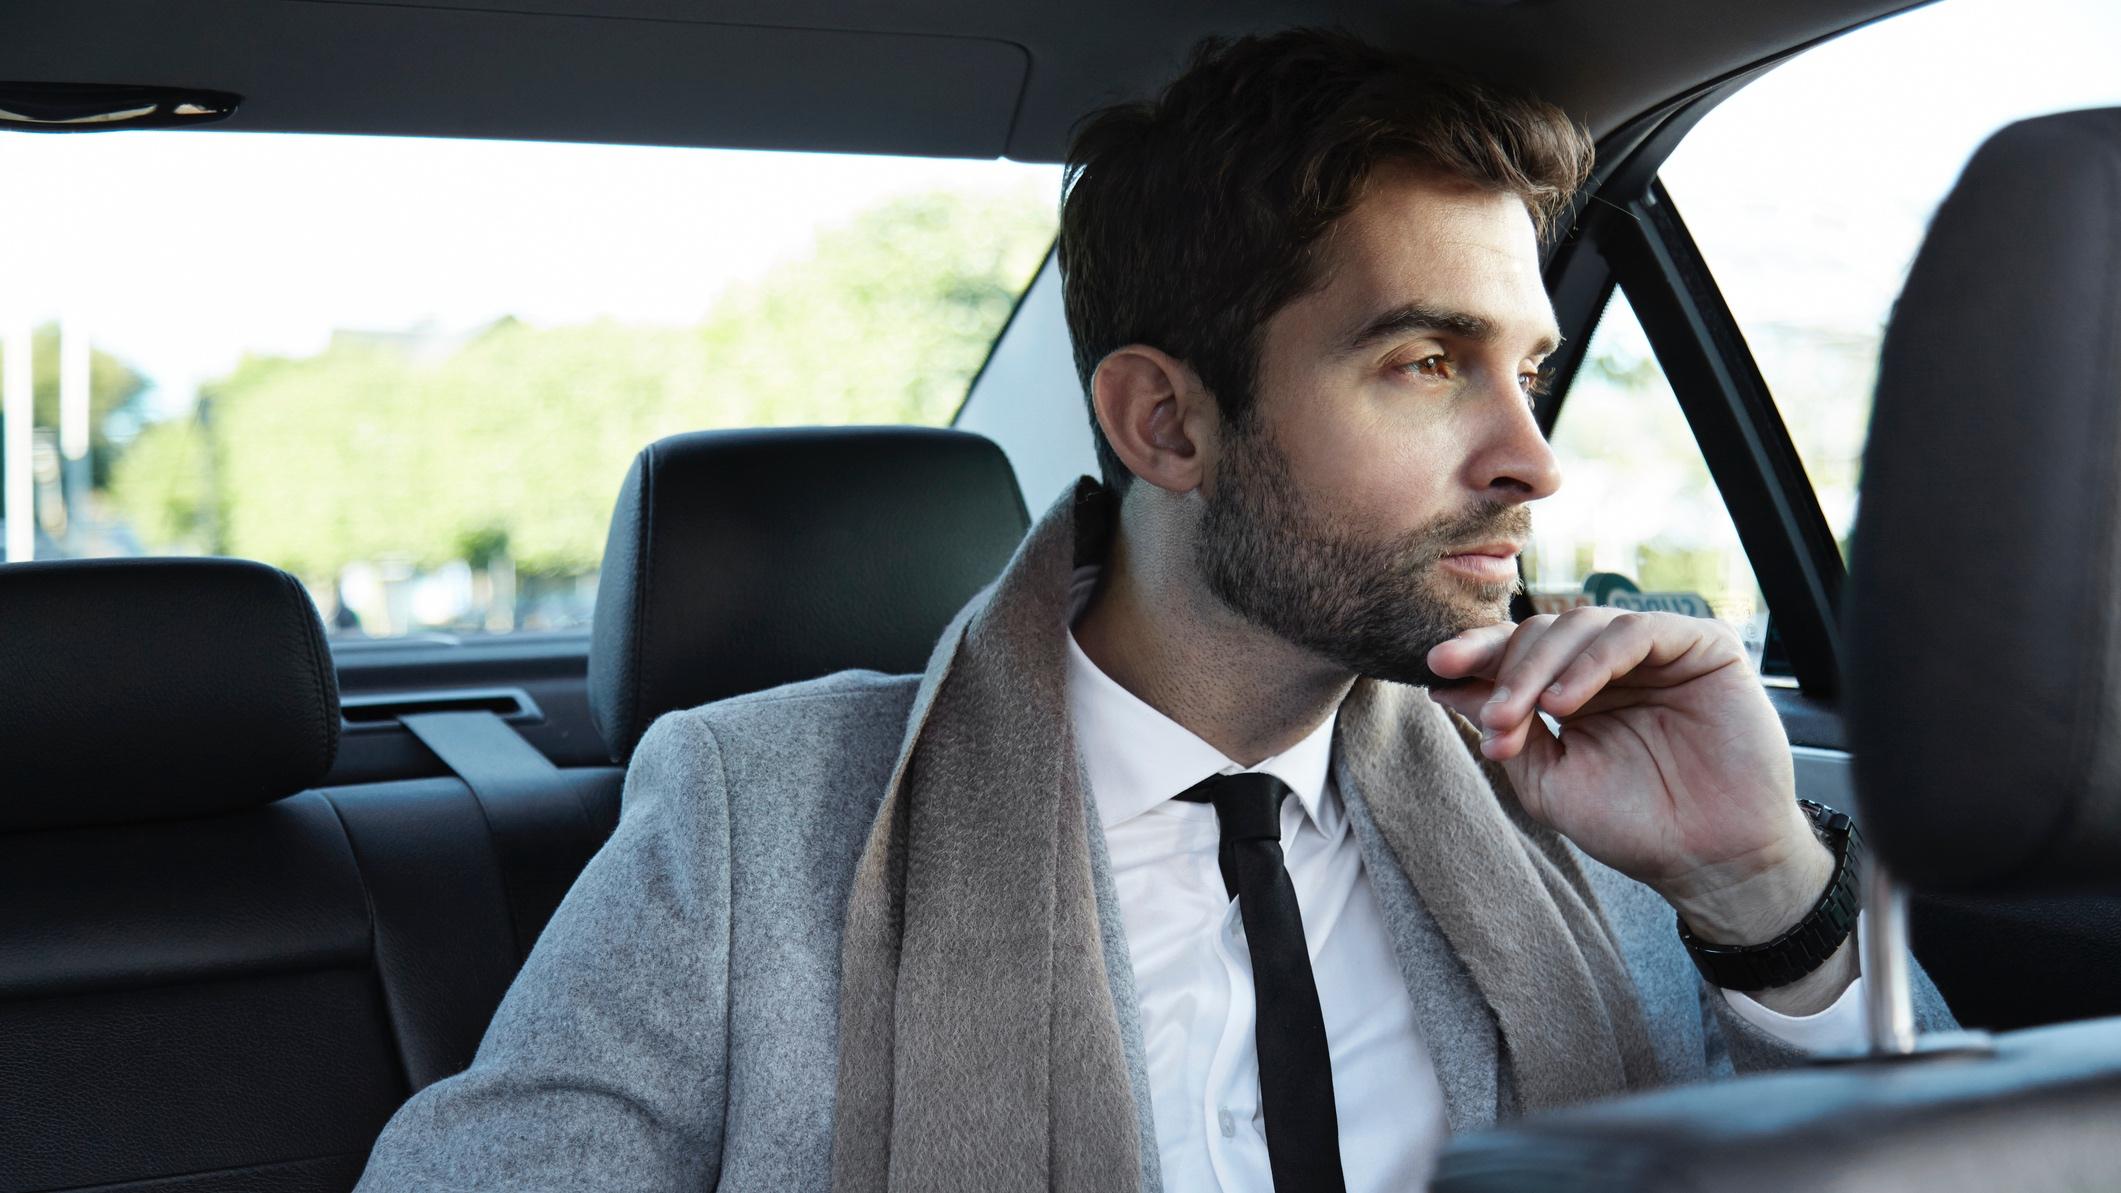 Business-car-615096666_2125x1416.jpeg